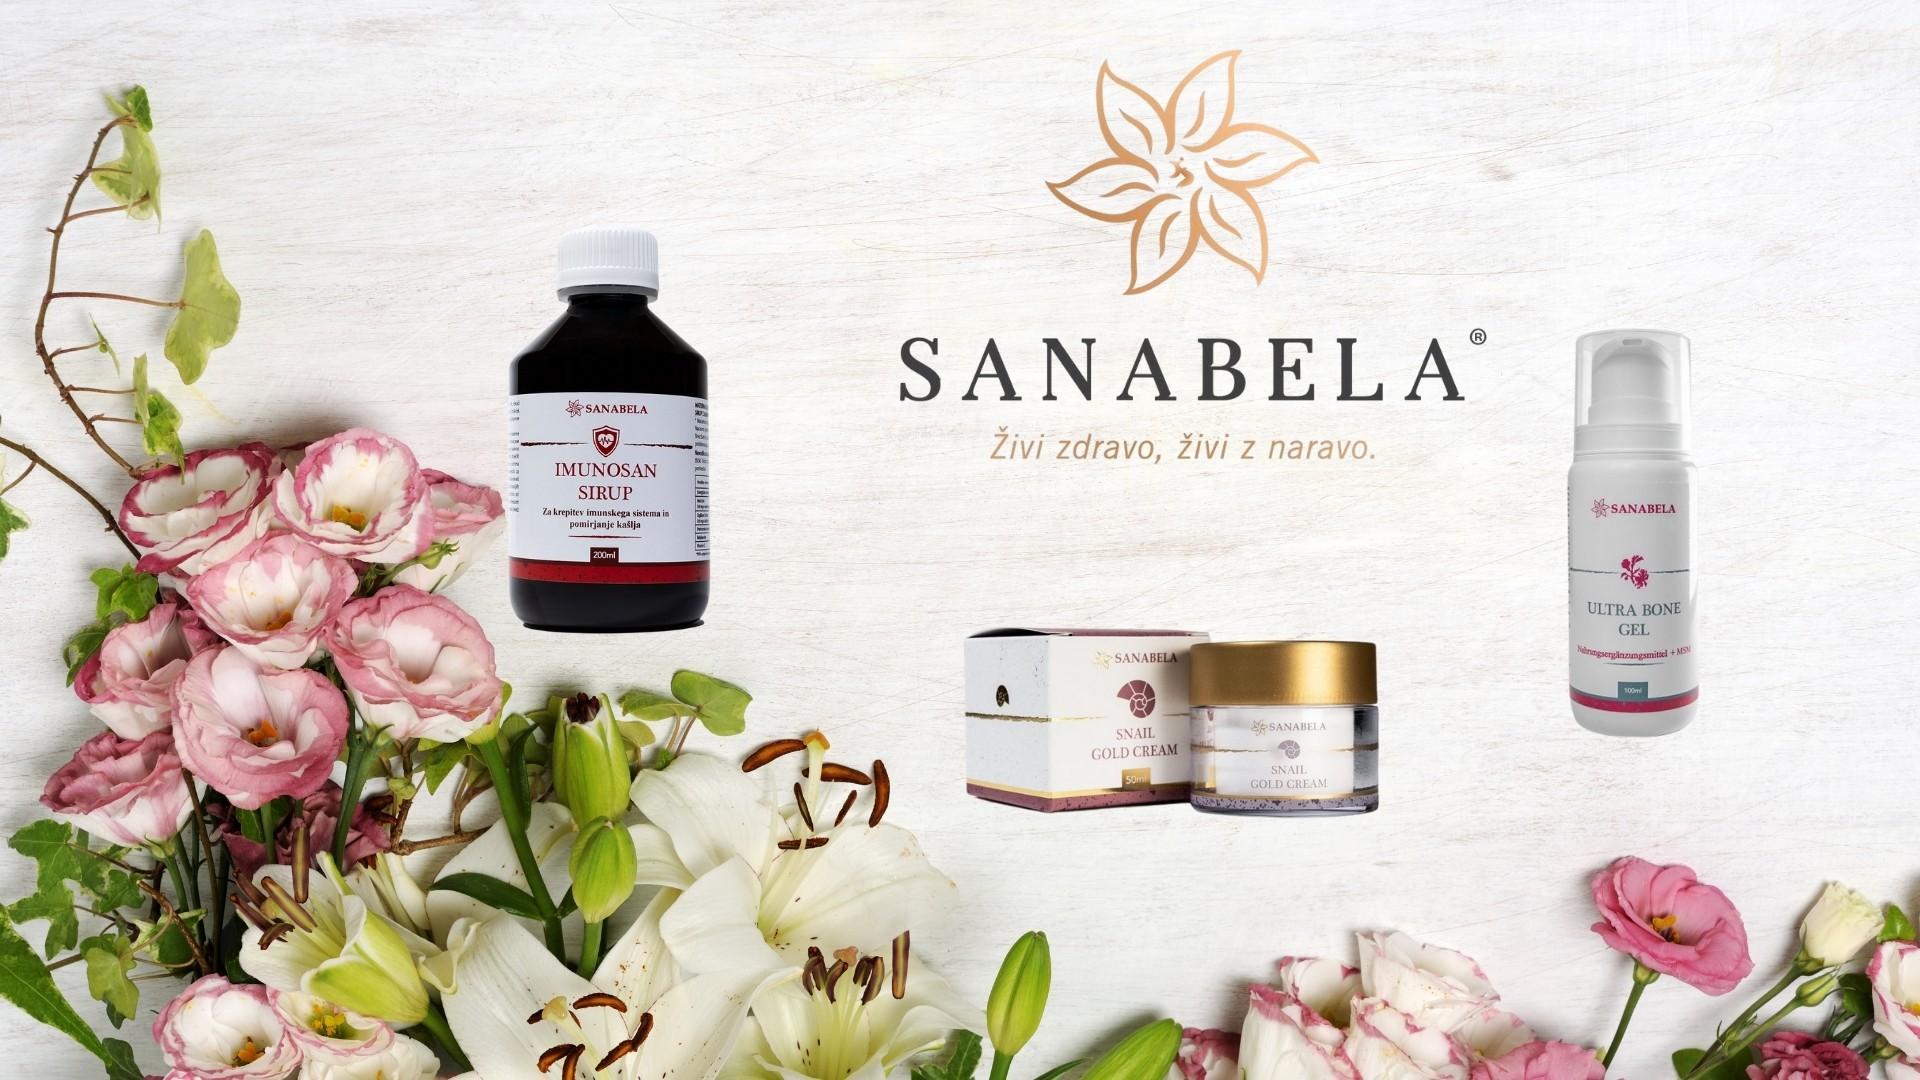 Sanabela